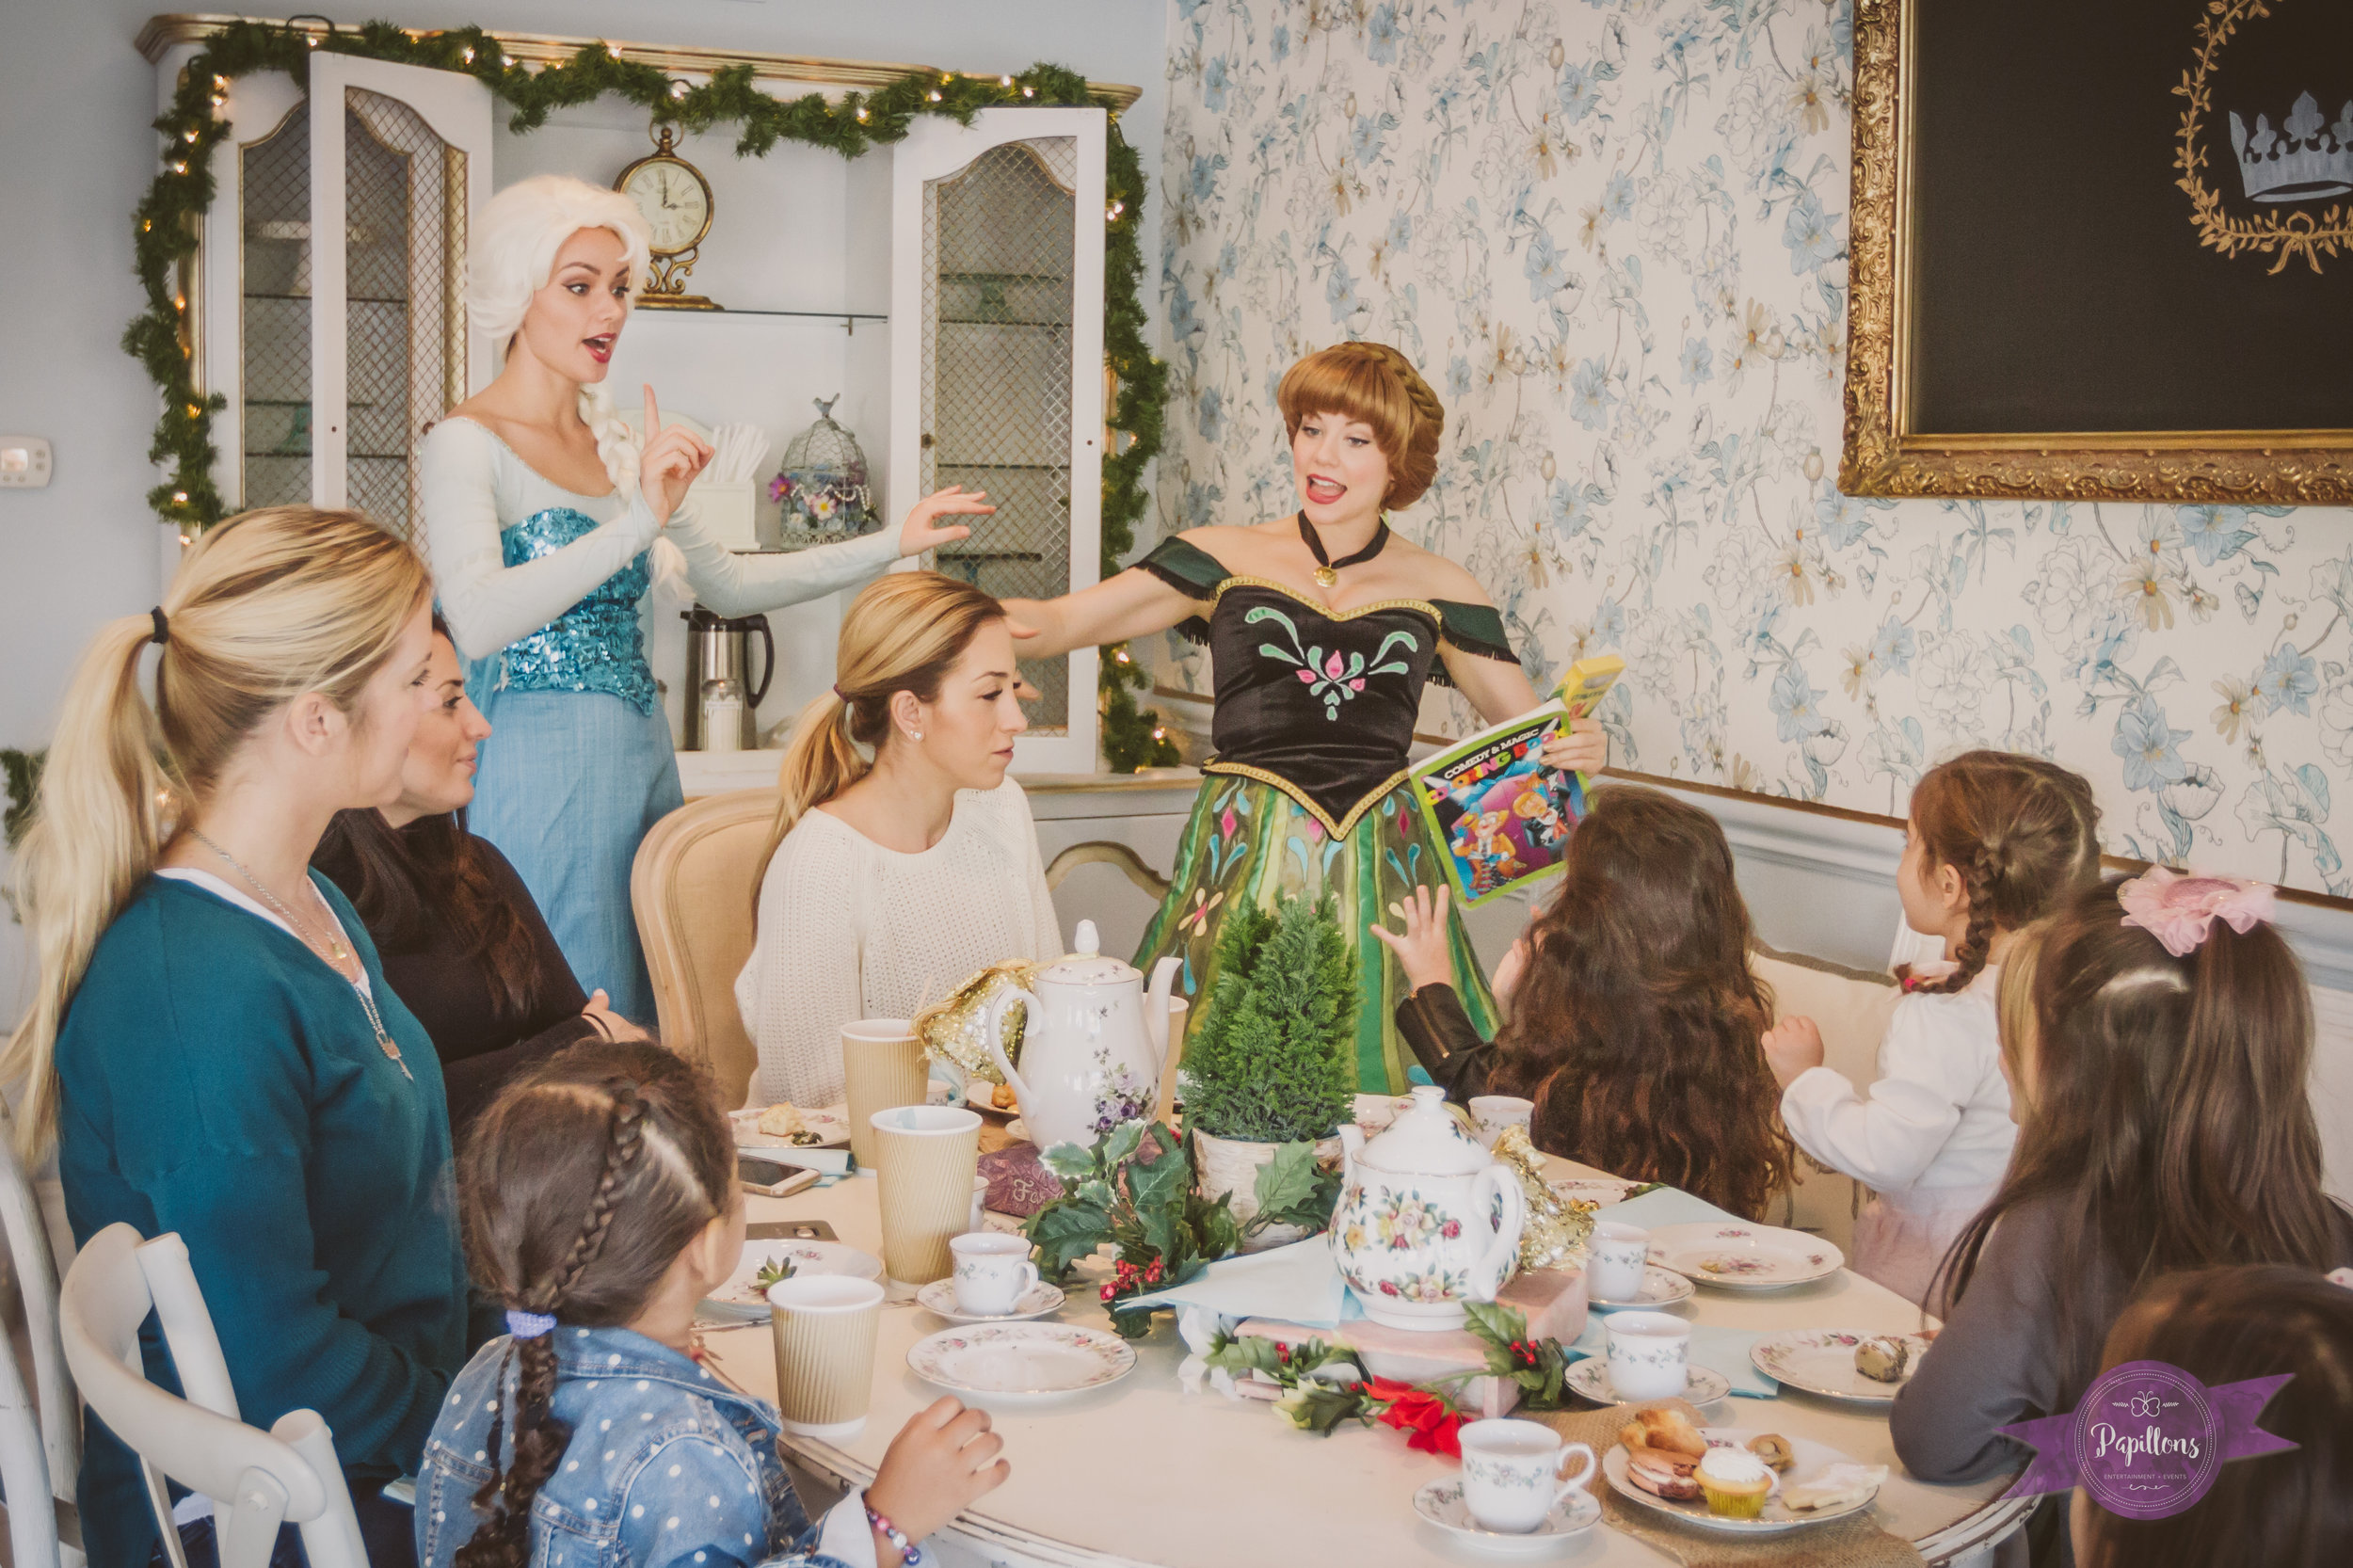 the french confection co queen elsa princess anna tea party burbank (1 of 1)-2.jpg